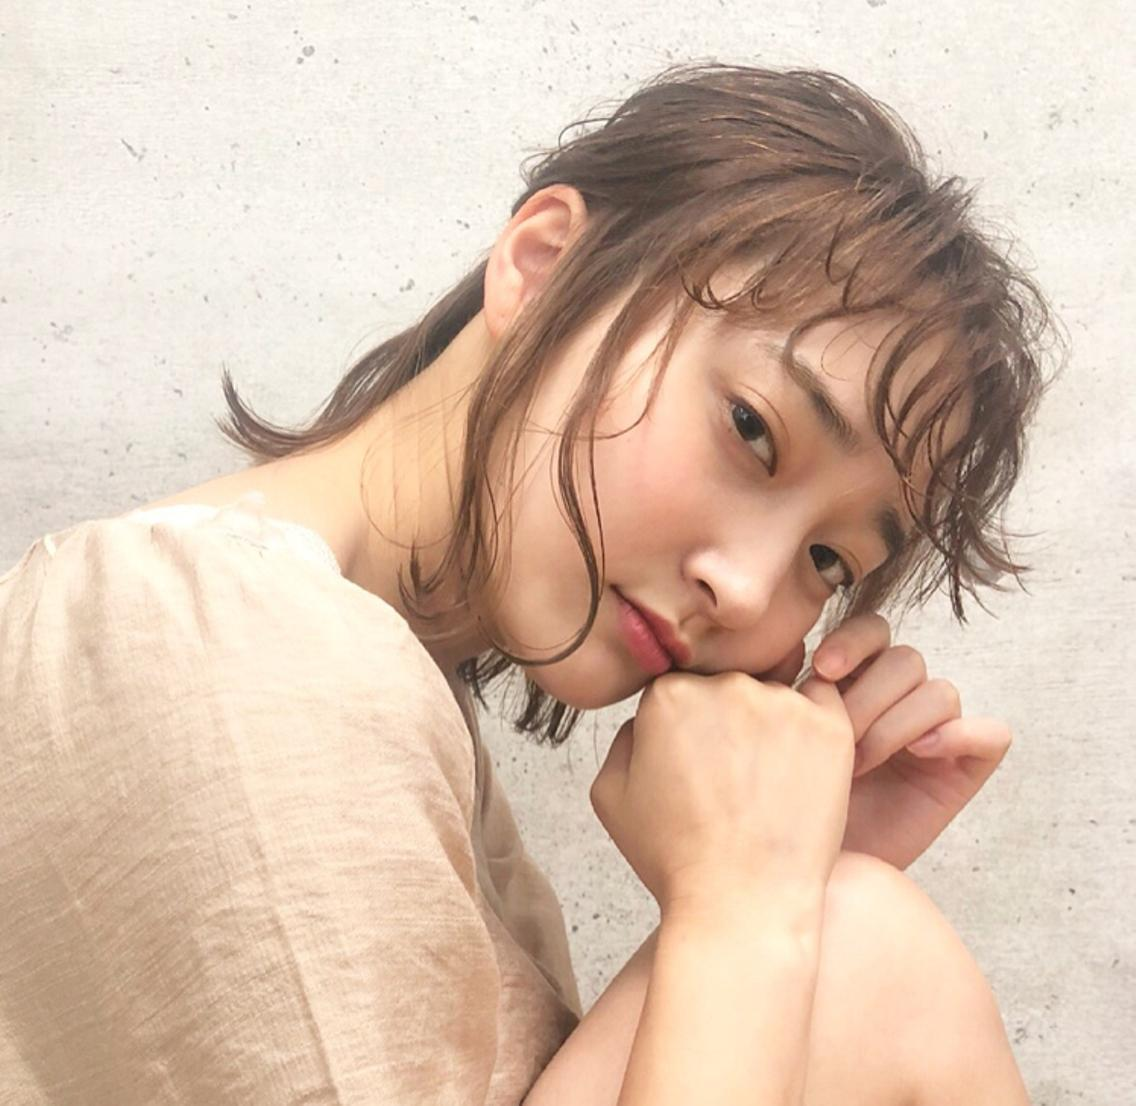 Neolive ora所属・❤︎宇野 芙美香❤︎の掲載